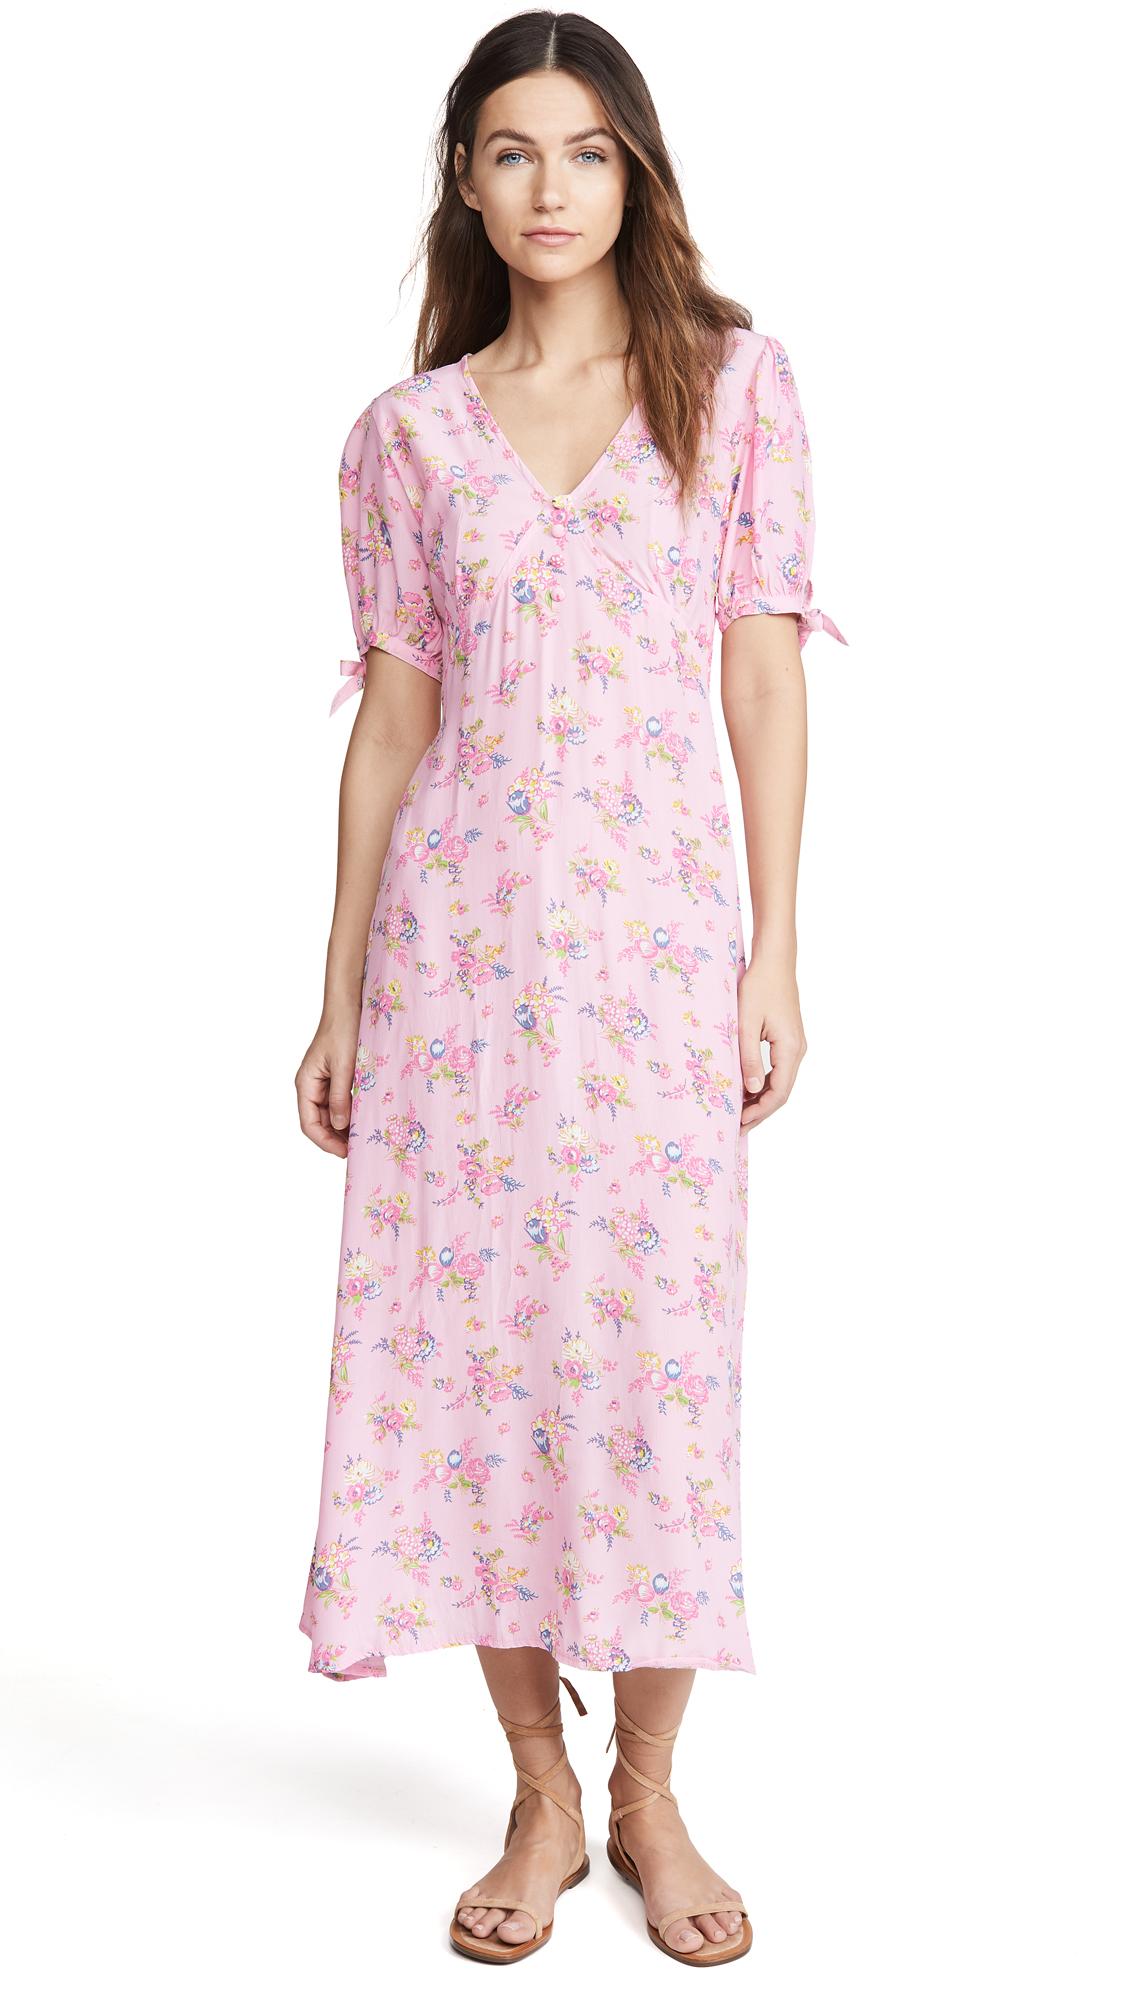 FAITHFULL THE BRAND Daija Midi Dress - 30% Off Sale